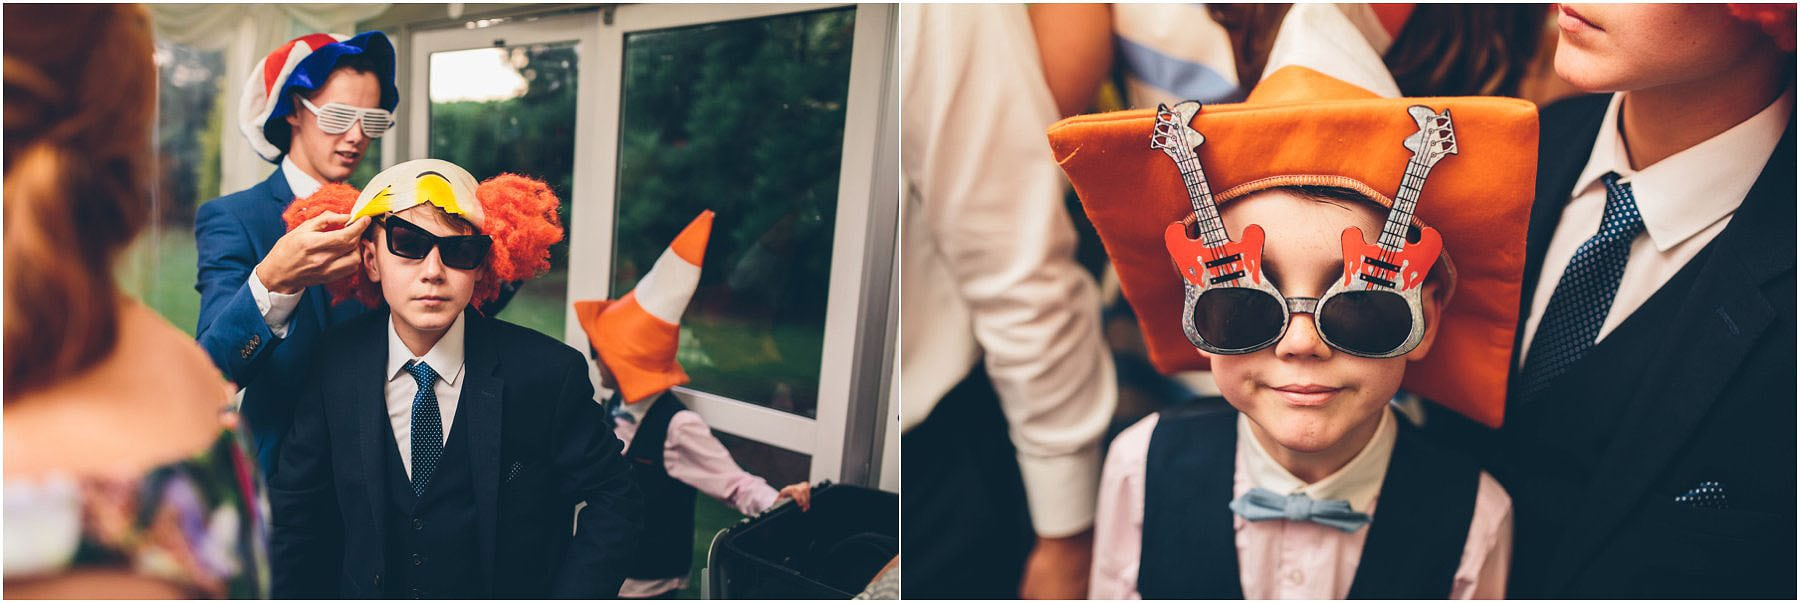 Soughton_Hall_Wedding_Photography_0153